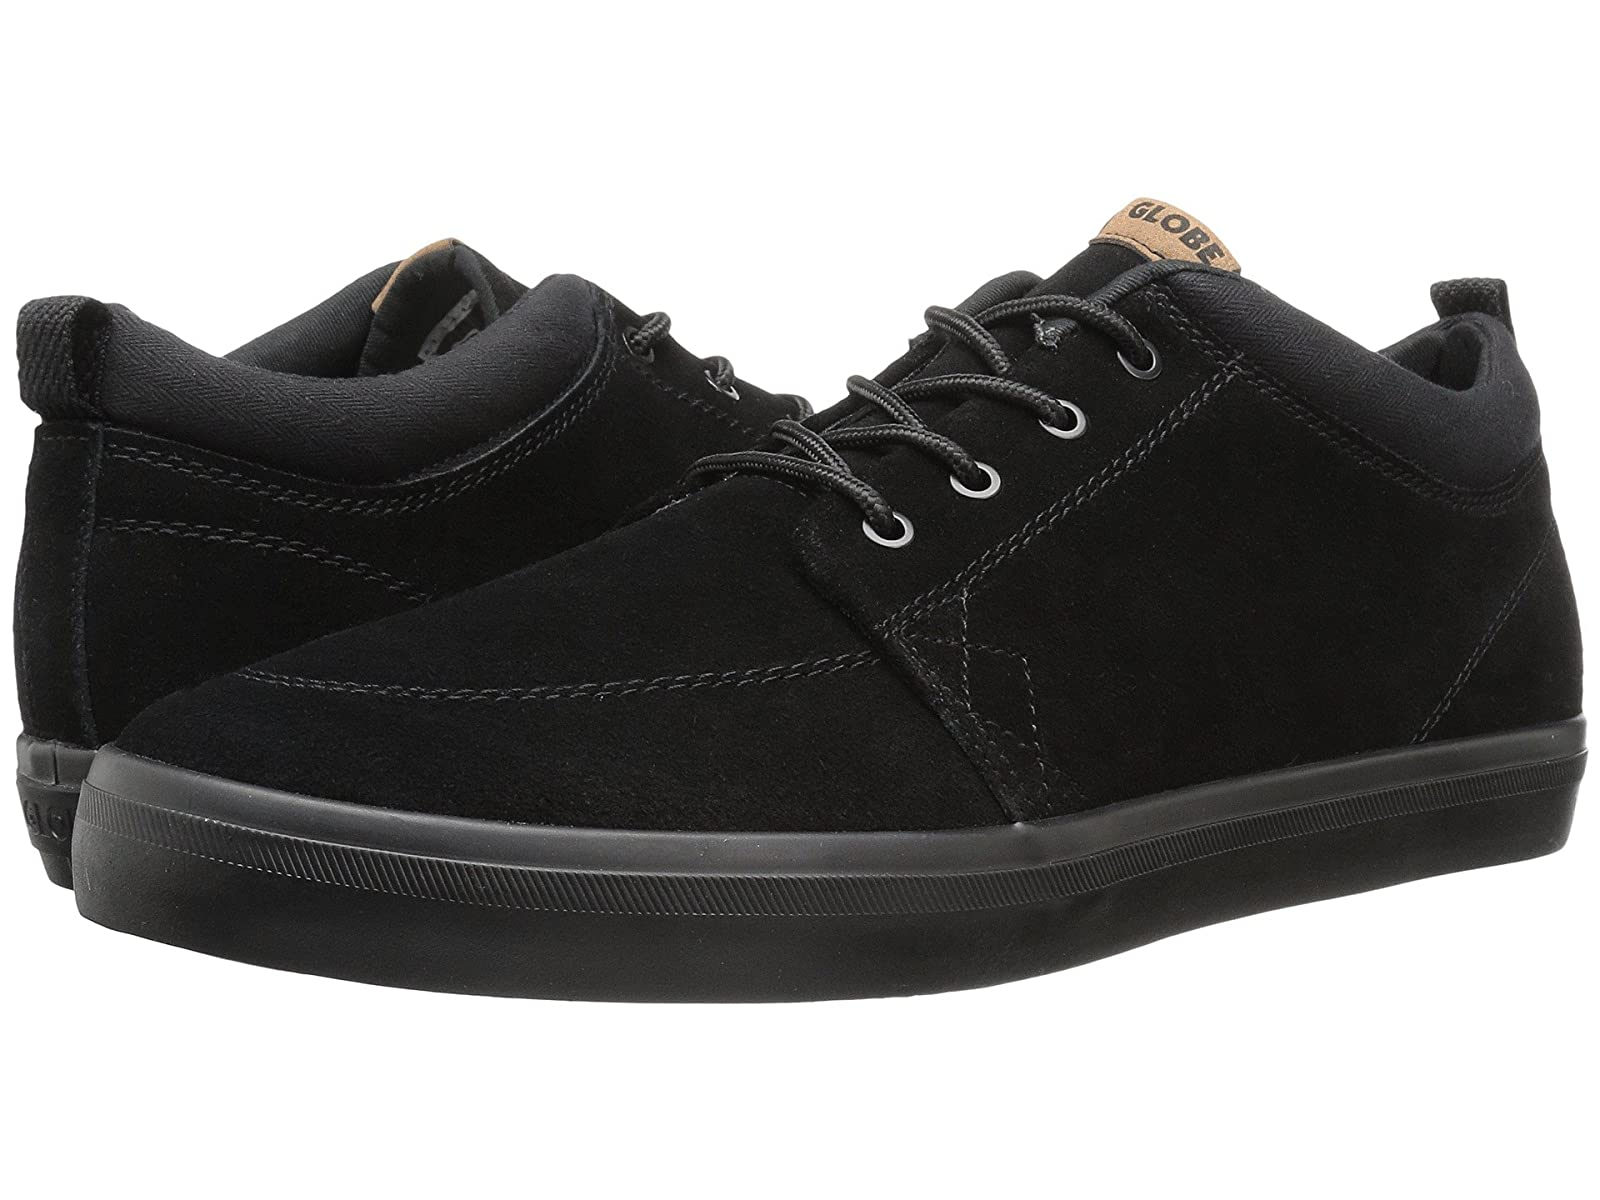 Globe GS ChukkaCheap and distinctive eye-catching shoes